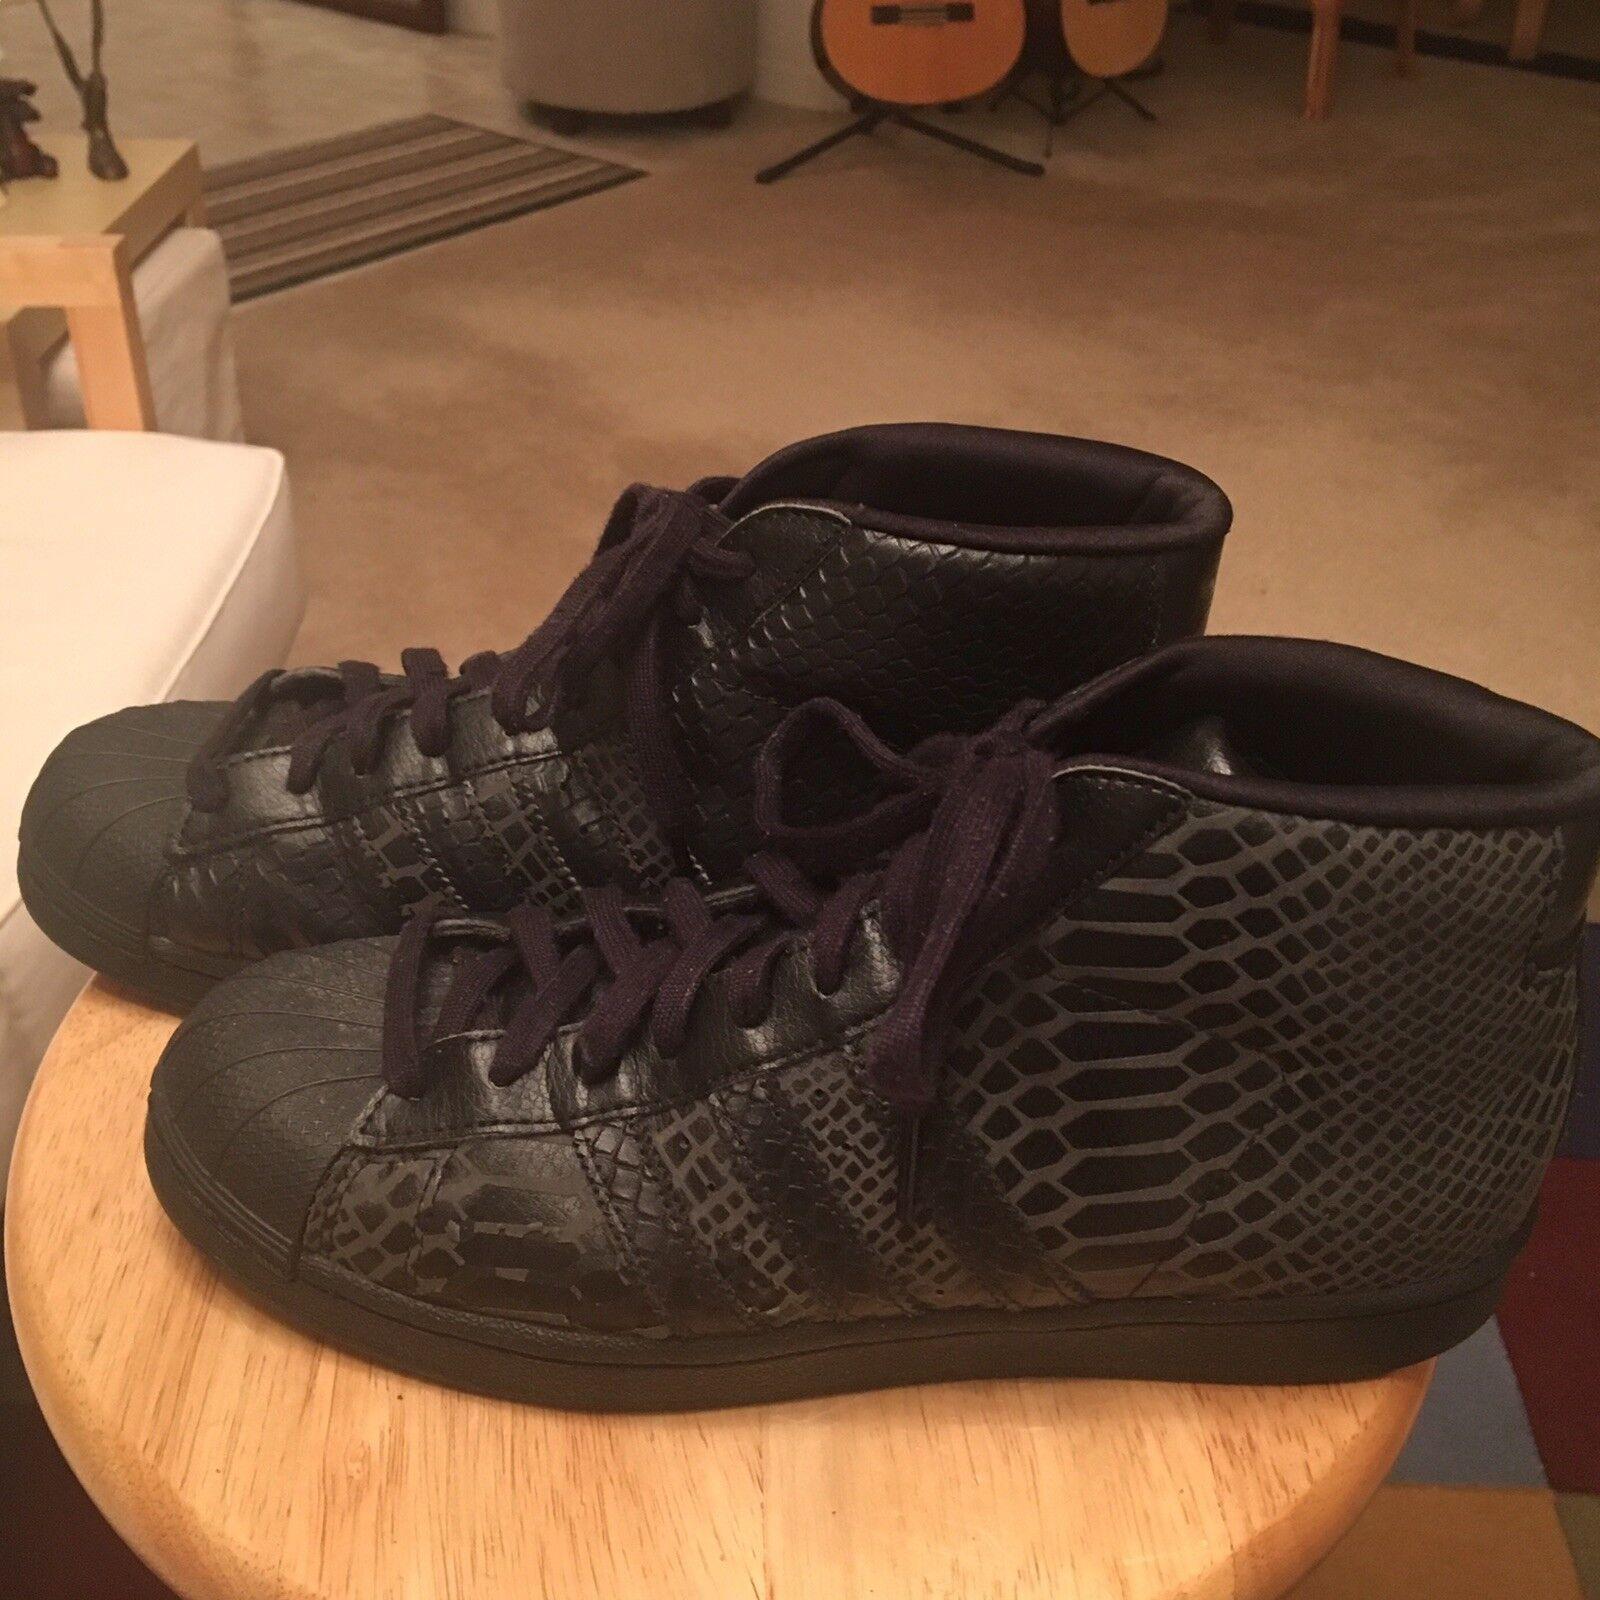 Adidas Originals S85960 Black Men's US8.5 Snakeskin Print Hi Top Sneakers shoes